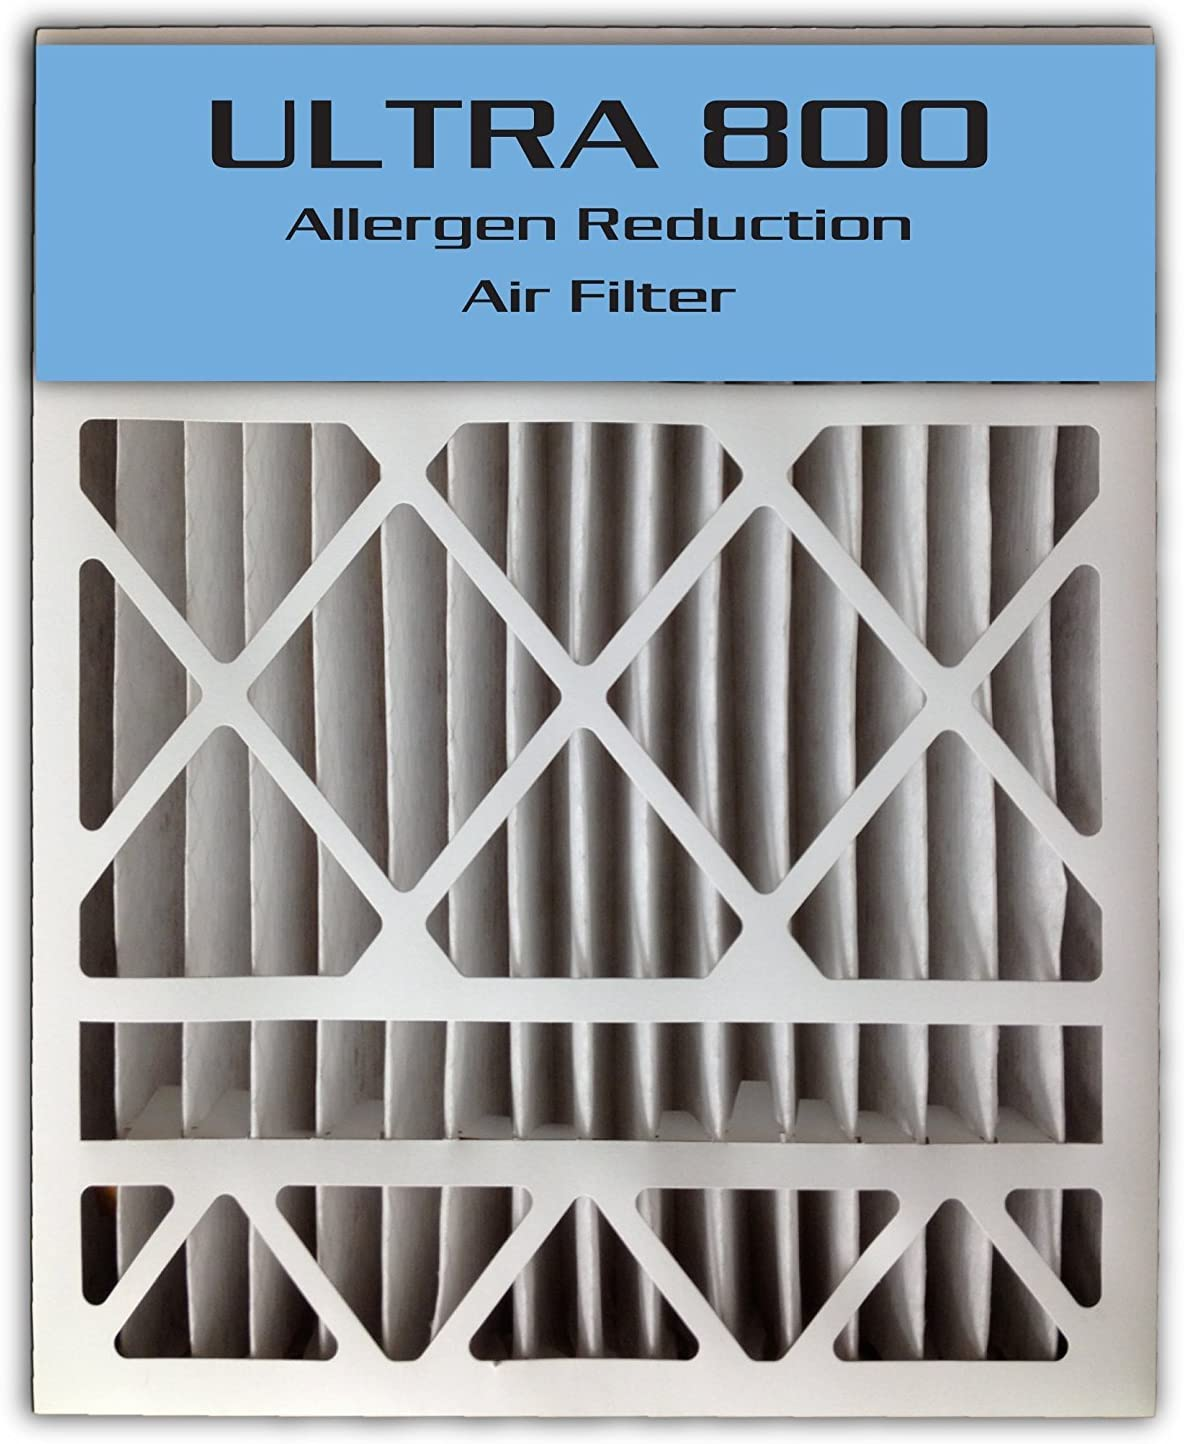 23.8x24.8x4.3 2-Pack ULTRA 800 MERV 8 Bryant Replacement Air Filter 24x25x4//24x25x5